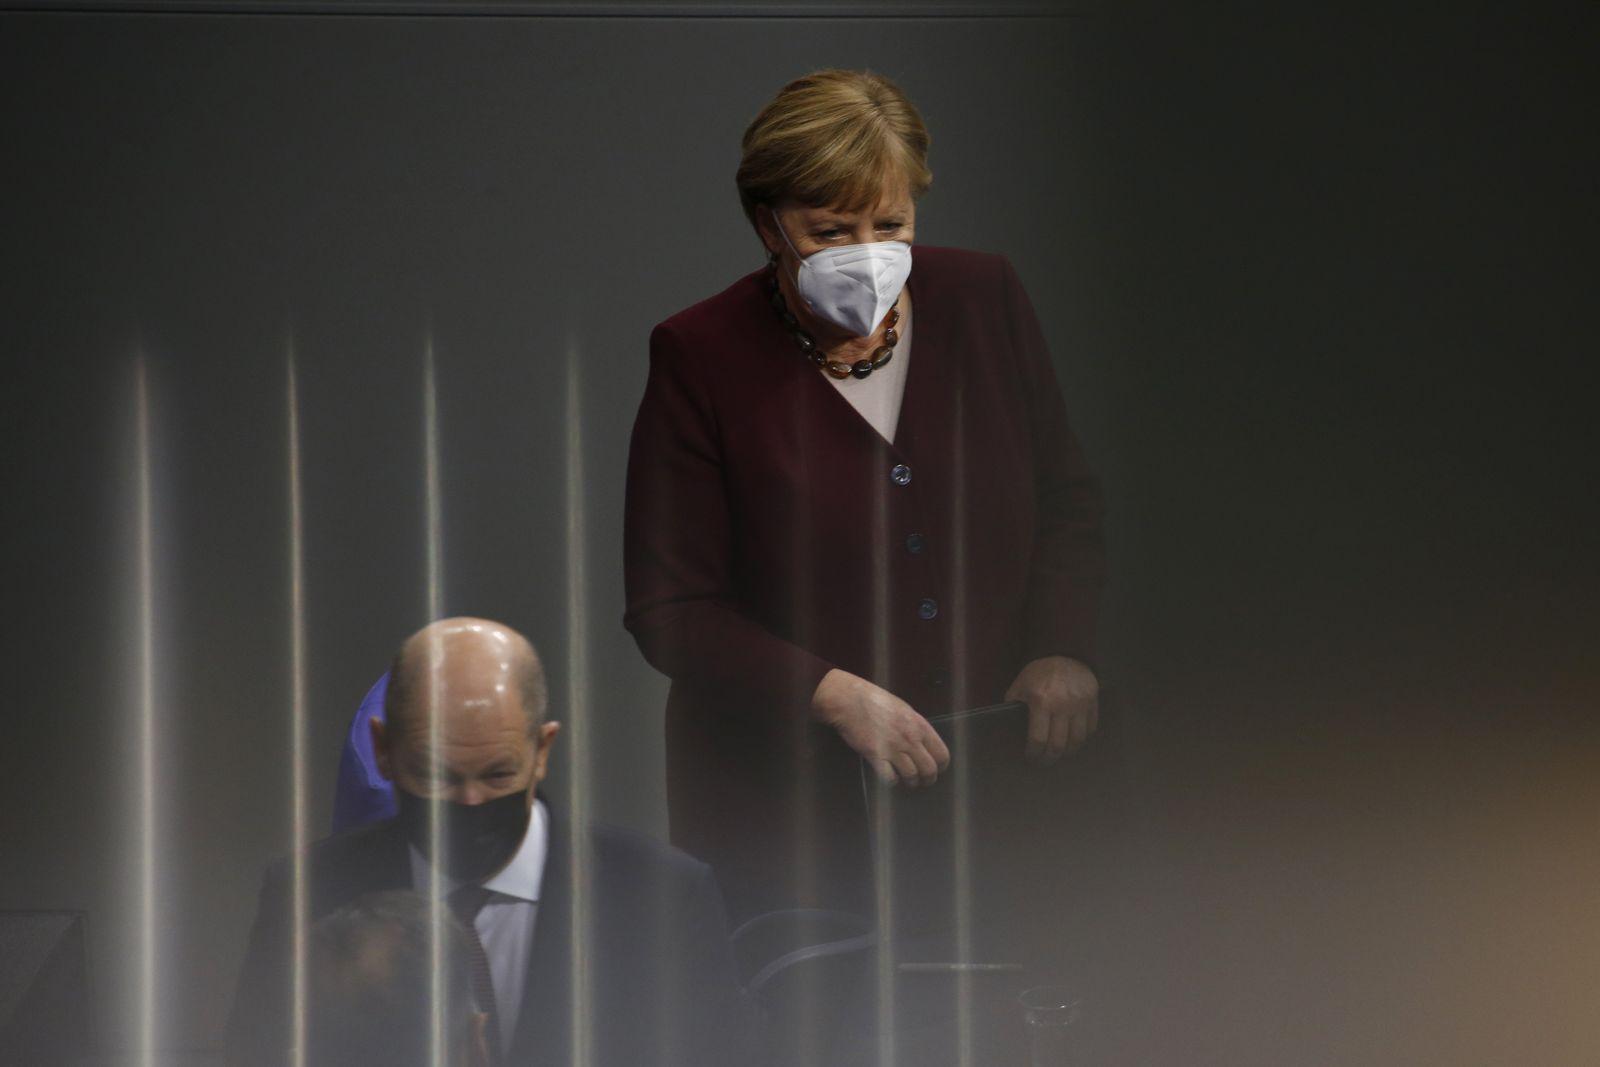 Merkel Gives Bundestag Address As Lockdown Measures Tighten